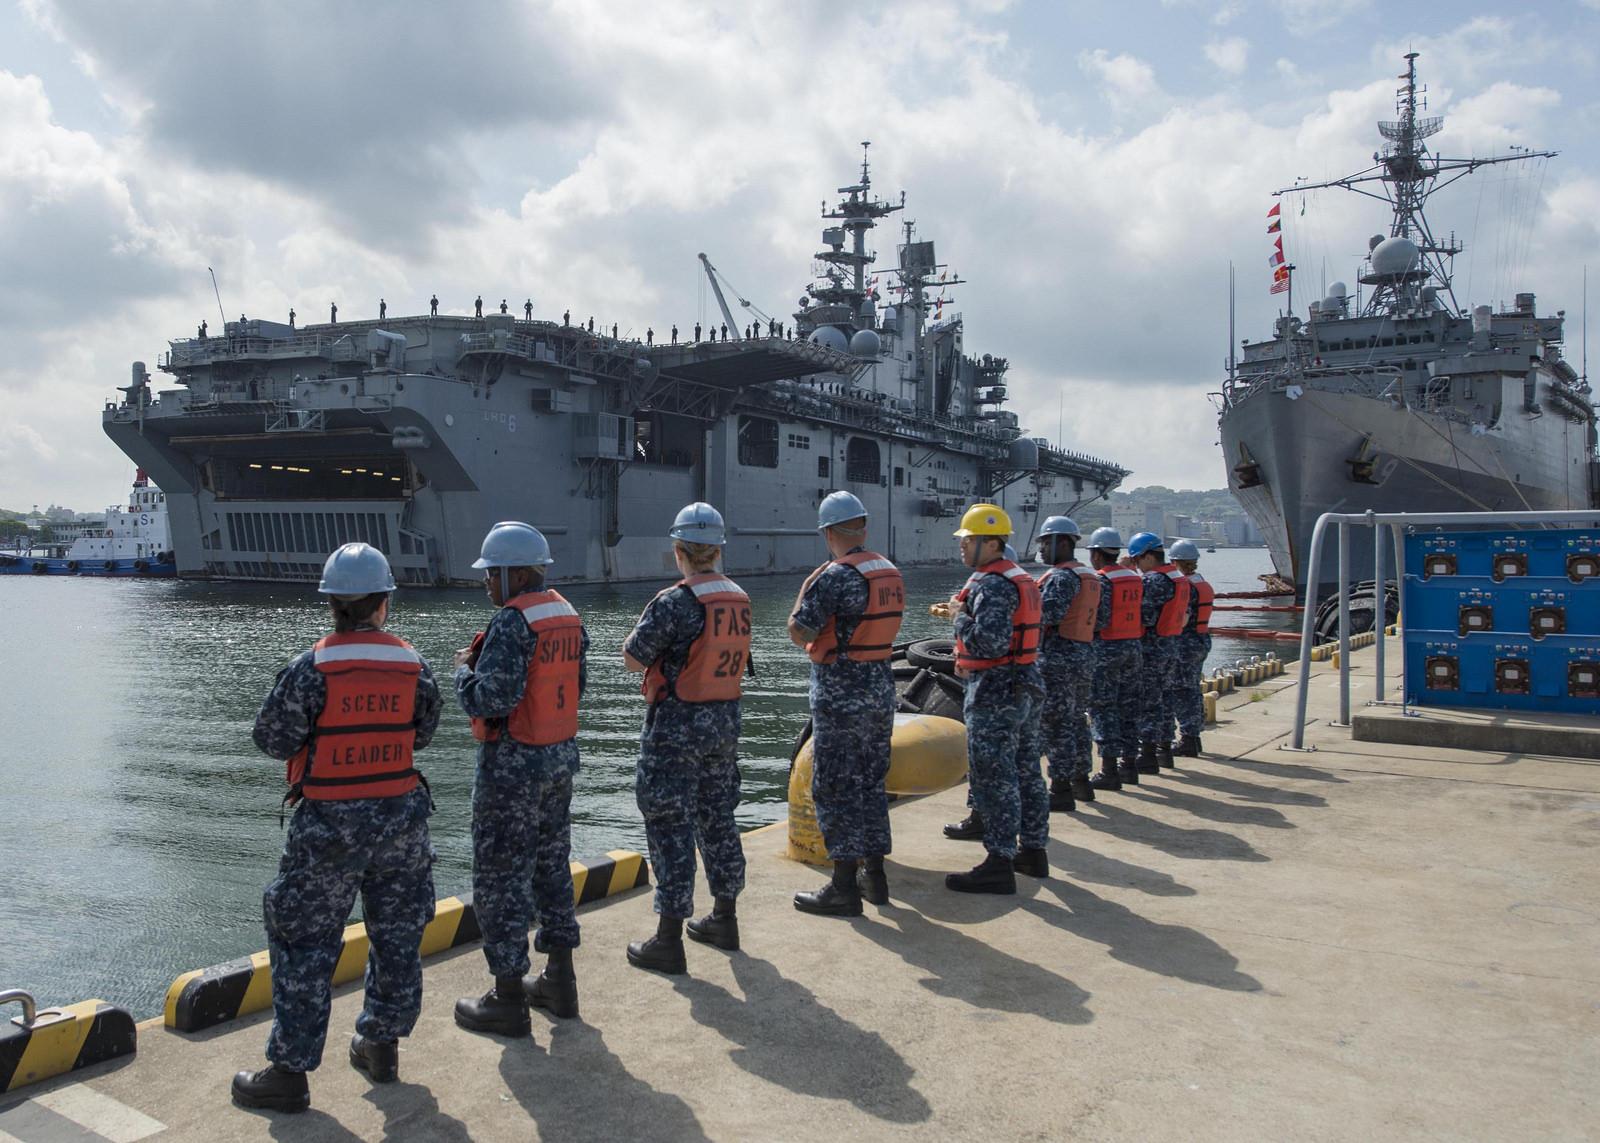 USS BONHOMME RICHARD LHD-6 Einlaufen Sasebo am 01.05.2014 Bild: U.S. Navy